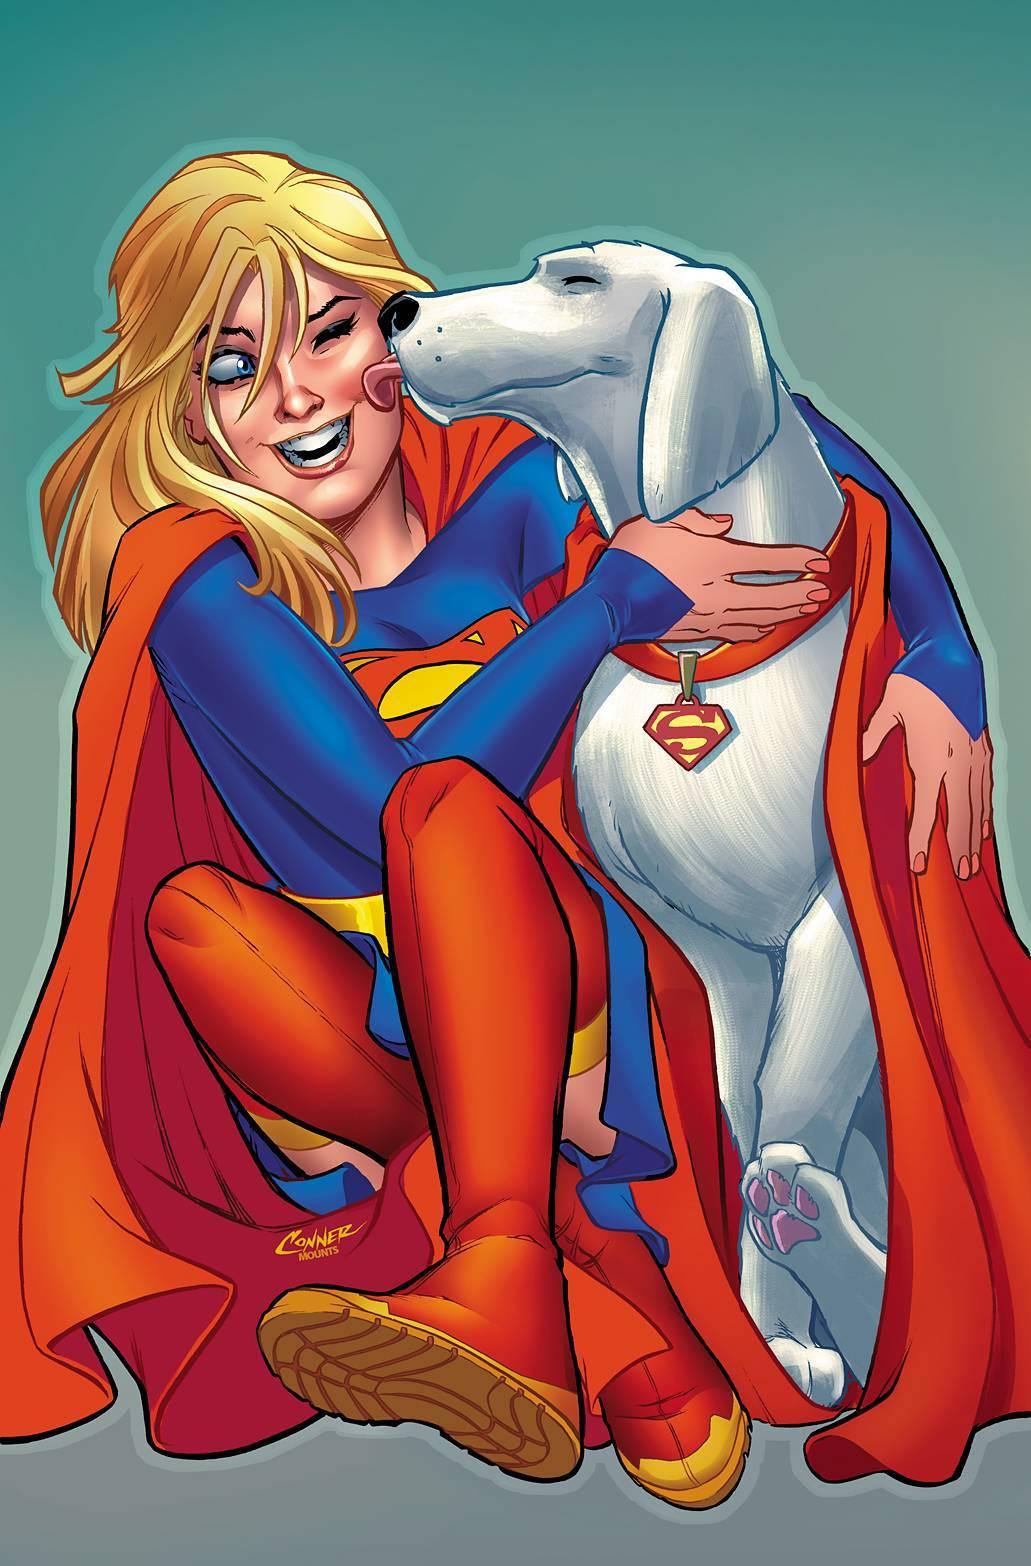 Supergirl Vol 7 21 Textless Variant.jpg